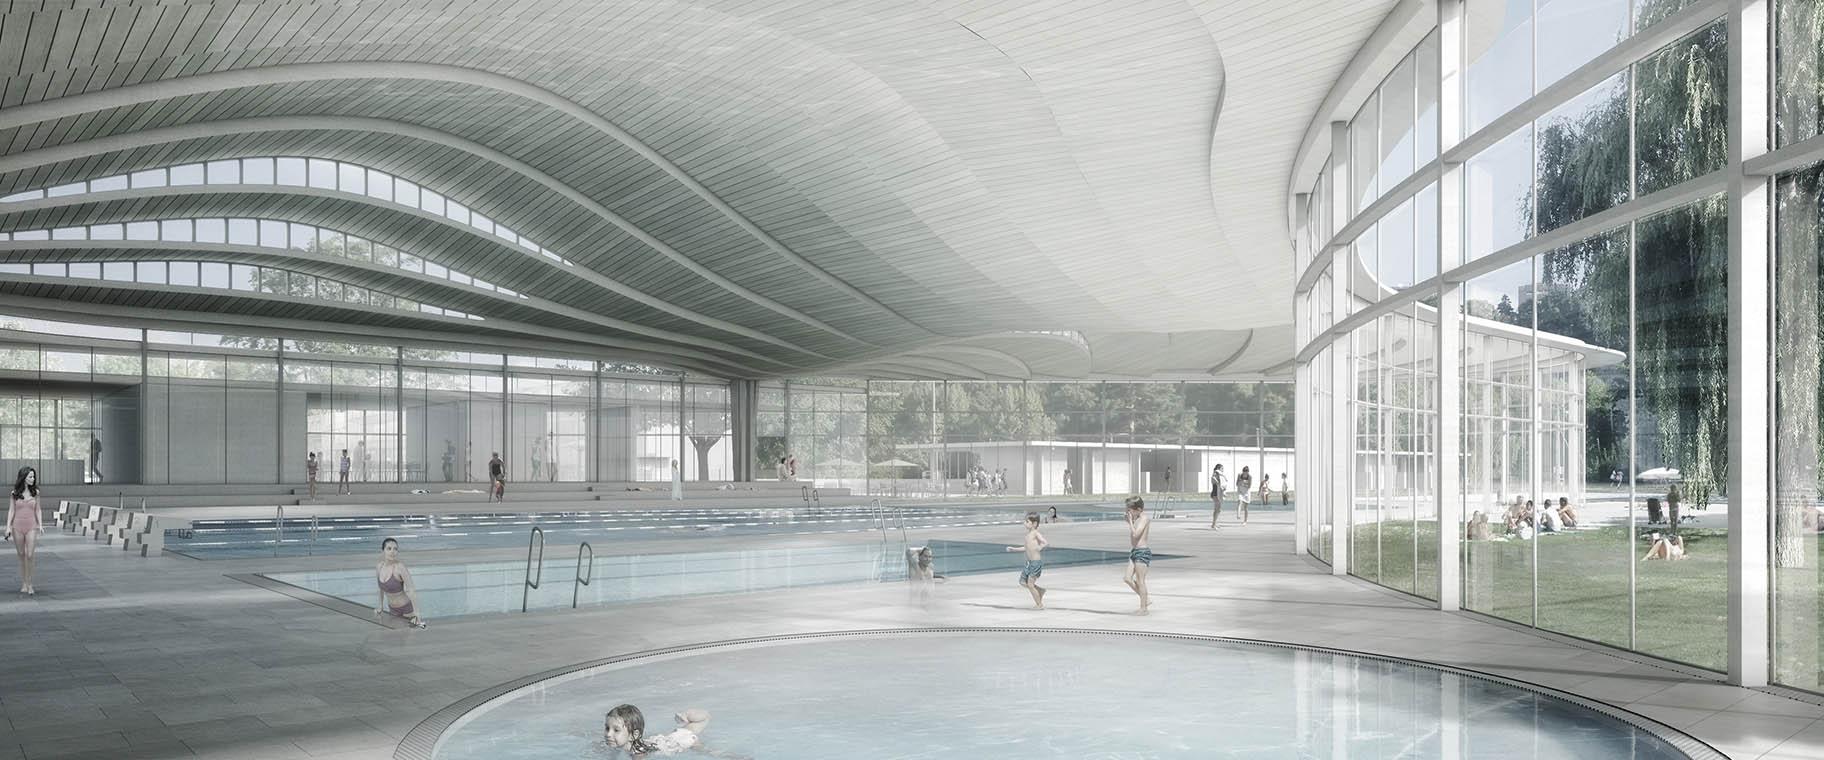 perspective-concours-piscine-fontenette-carouge-projet-vimade-architectes-paysagistes-collinfontaine-archigraphie-interieur